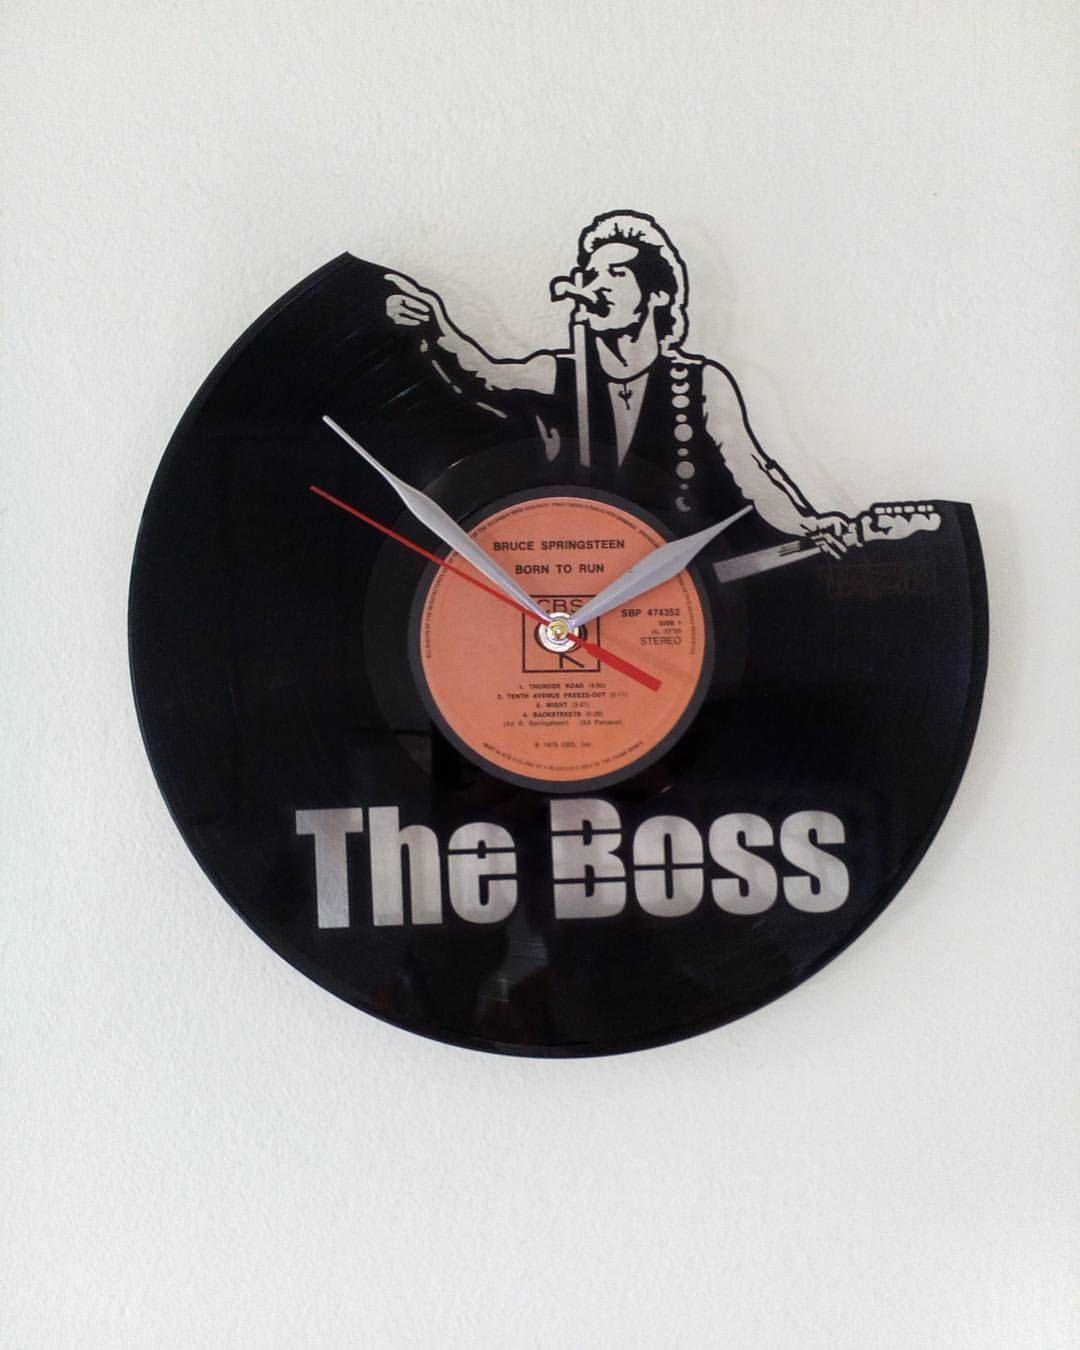 Bruce Springsteen Wallclock Made Of Old Used Vinyl Record By Tazindizajn On Etsy Used Vinyl Records Bruce Springsteen Vinyl Records